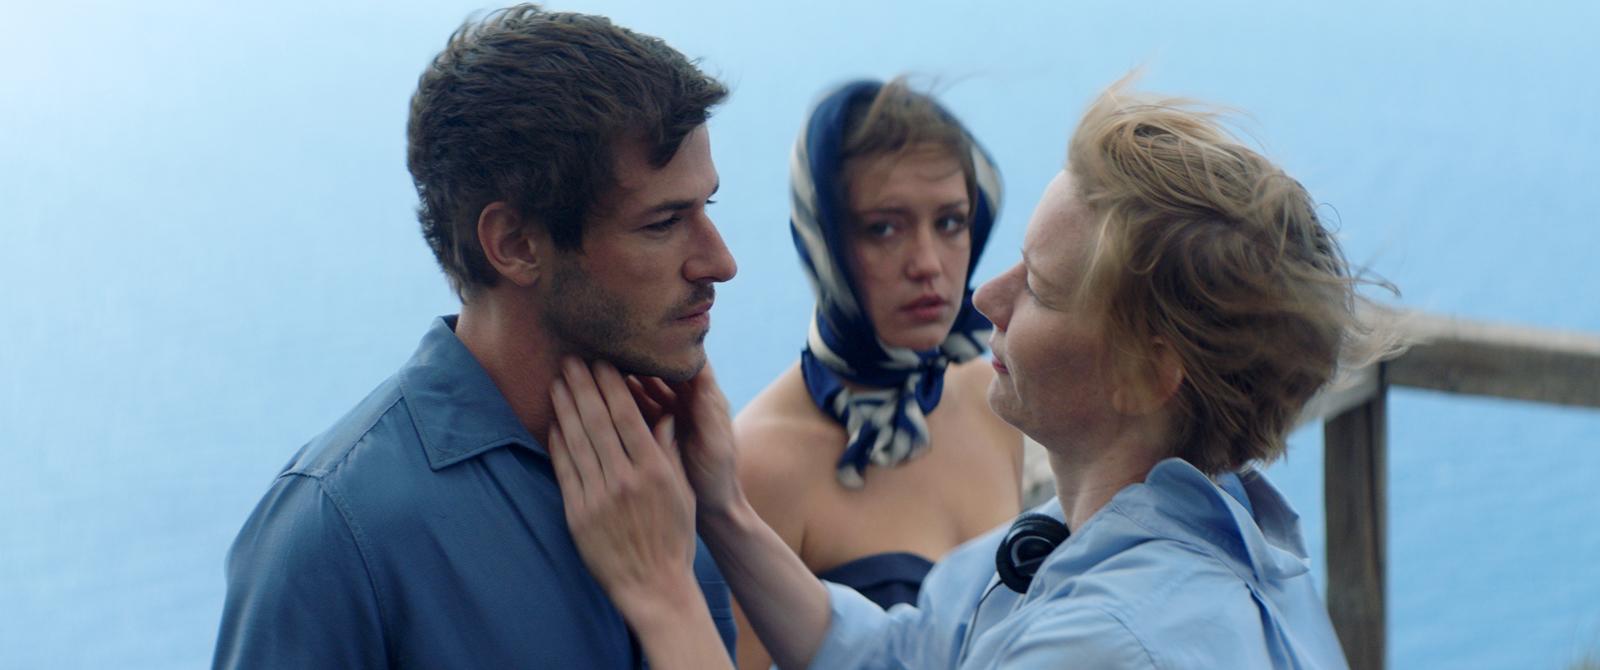 Sibyl - Photo Adèle Exarchopoulos, Gaspard Ulliel, Sandra Hüller critique avis film cannes 2019